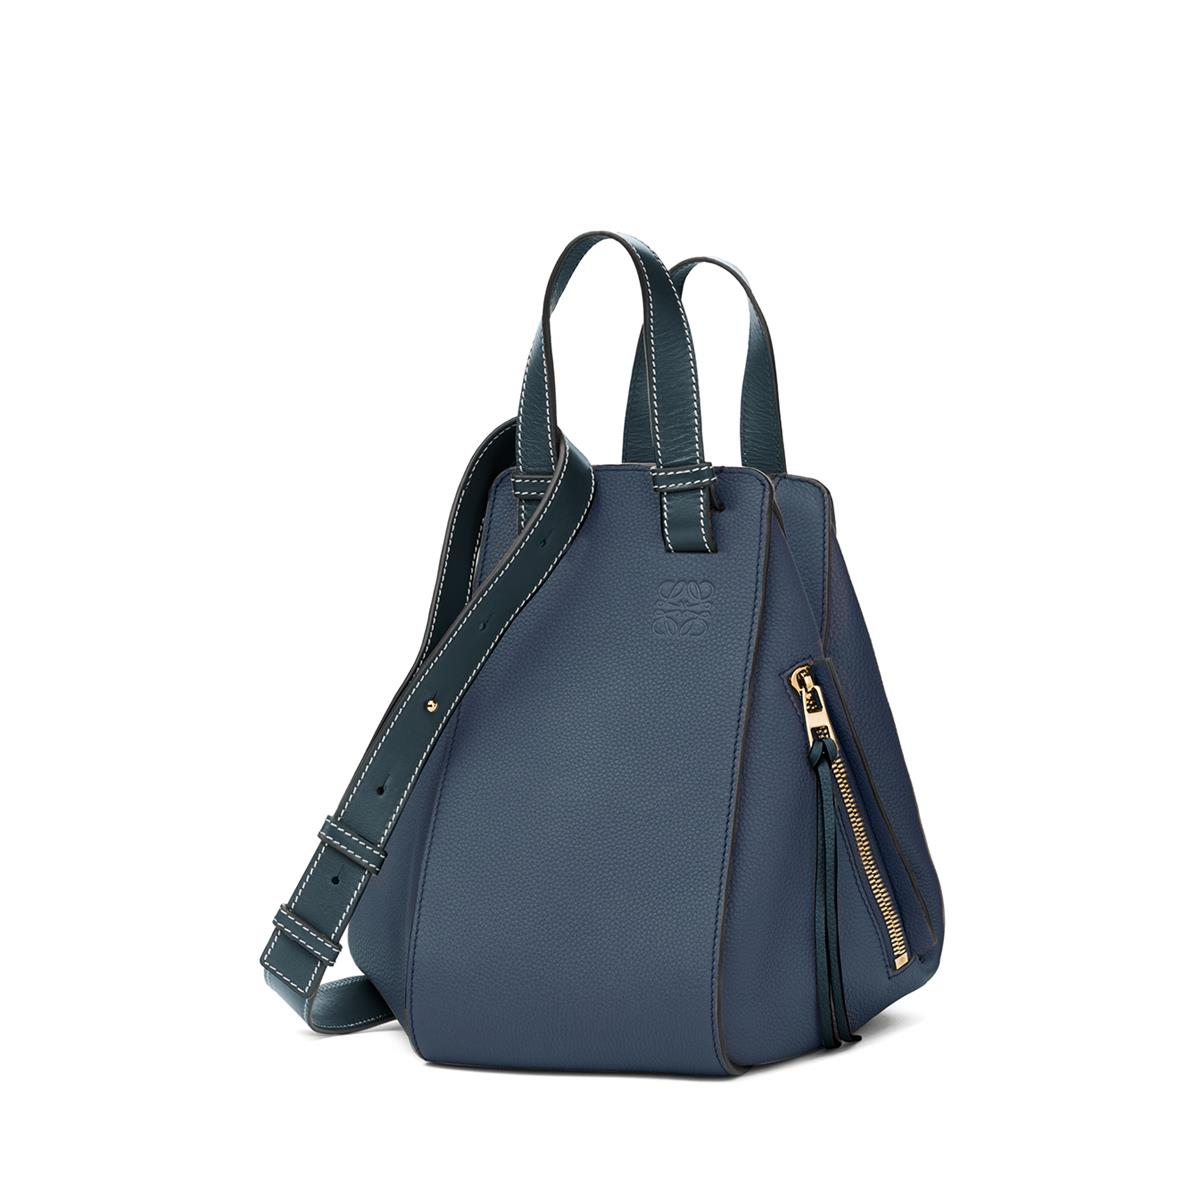 Hammock Small Bag 靛藍色 - LOEWE